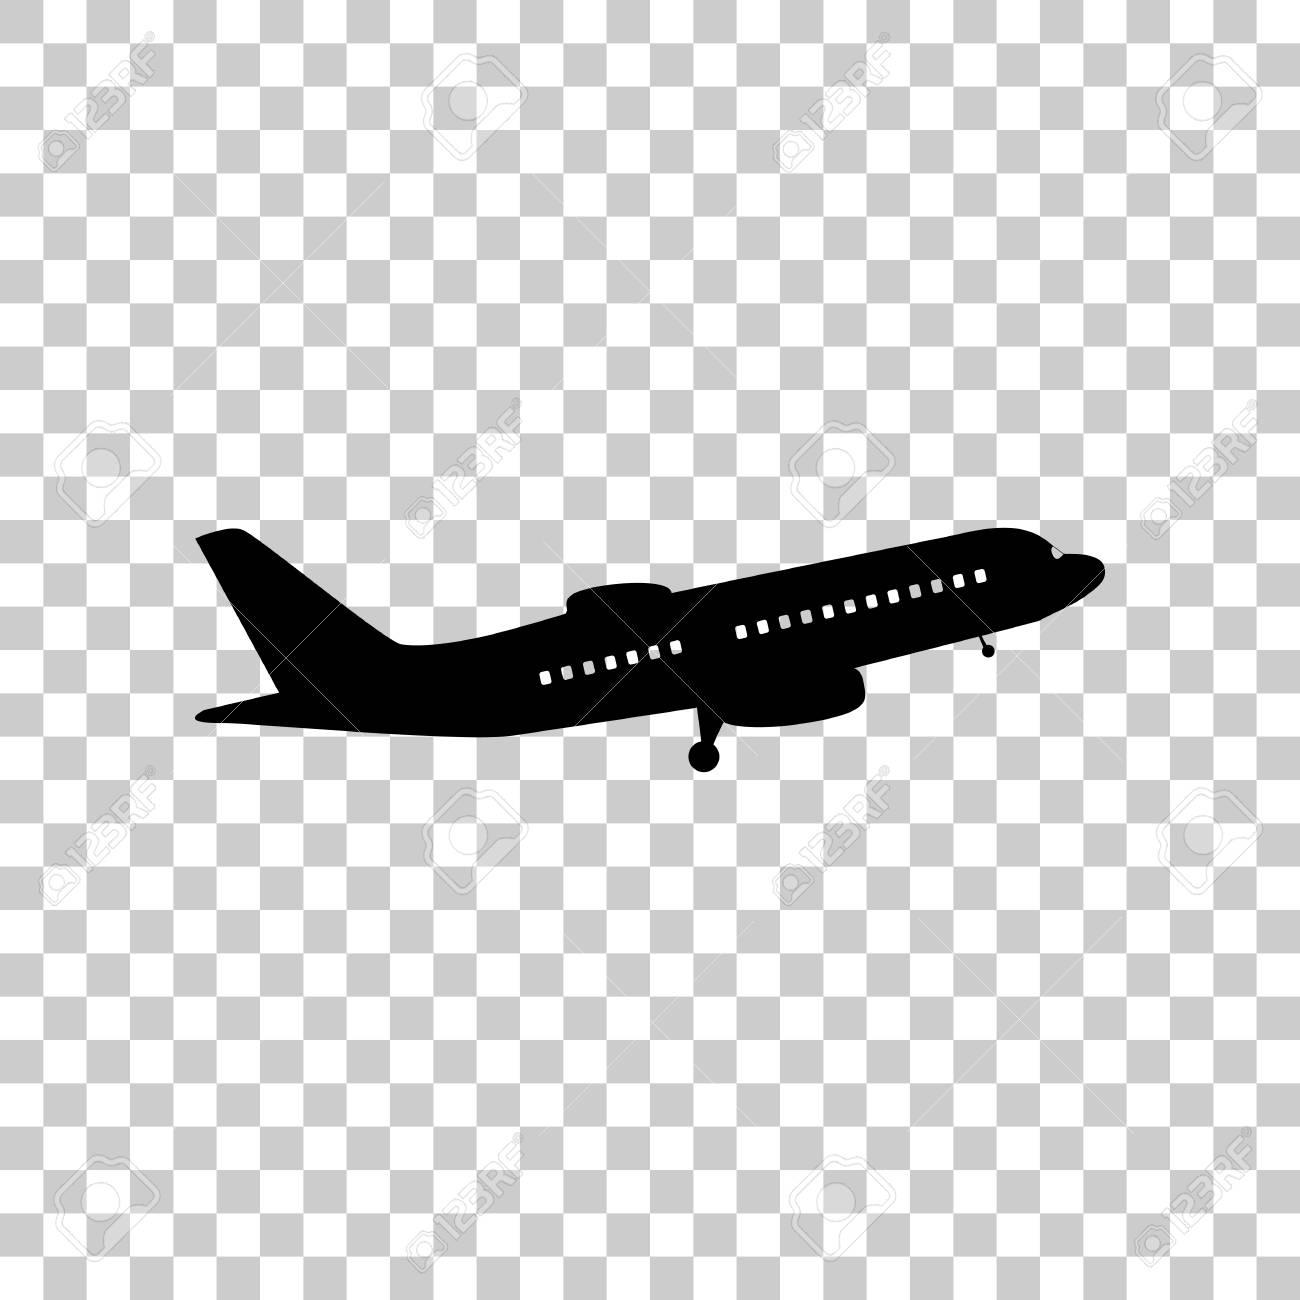 Flying Plane Sign Side View Black Icon On Transparent Backgrou